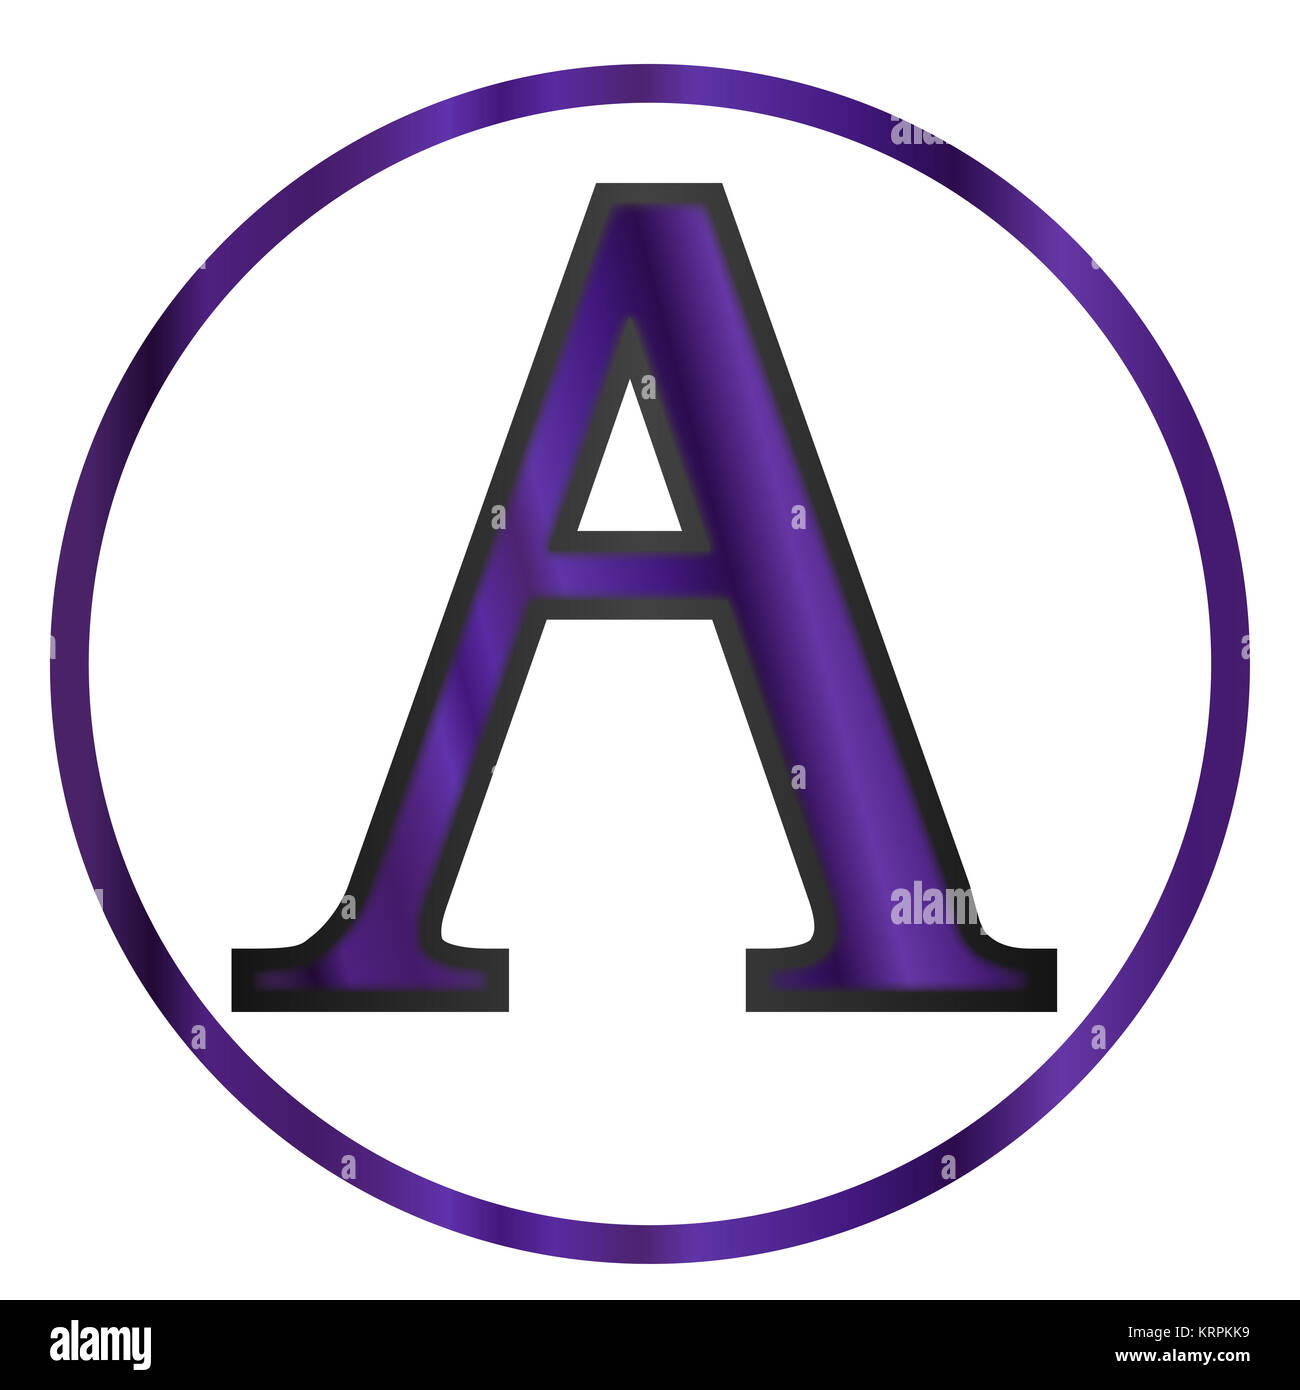 Greek letter alpha stock photos greek letter alpha stock images alpha greek letter stock image buycottarizona